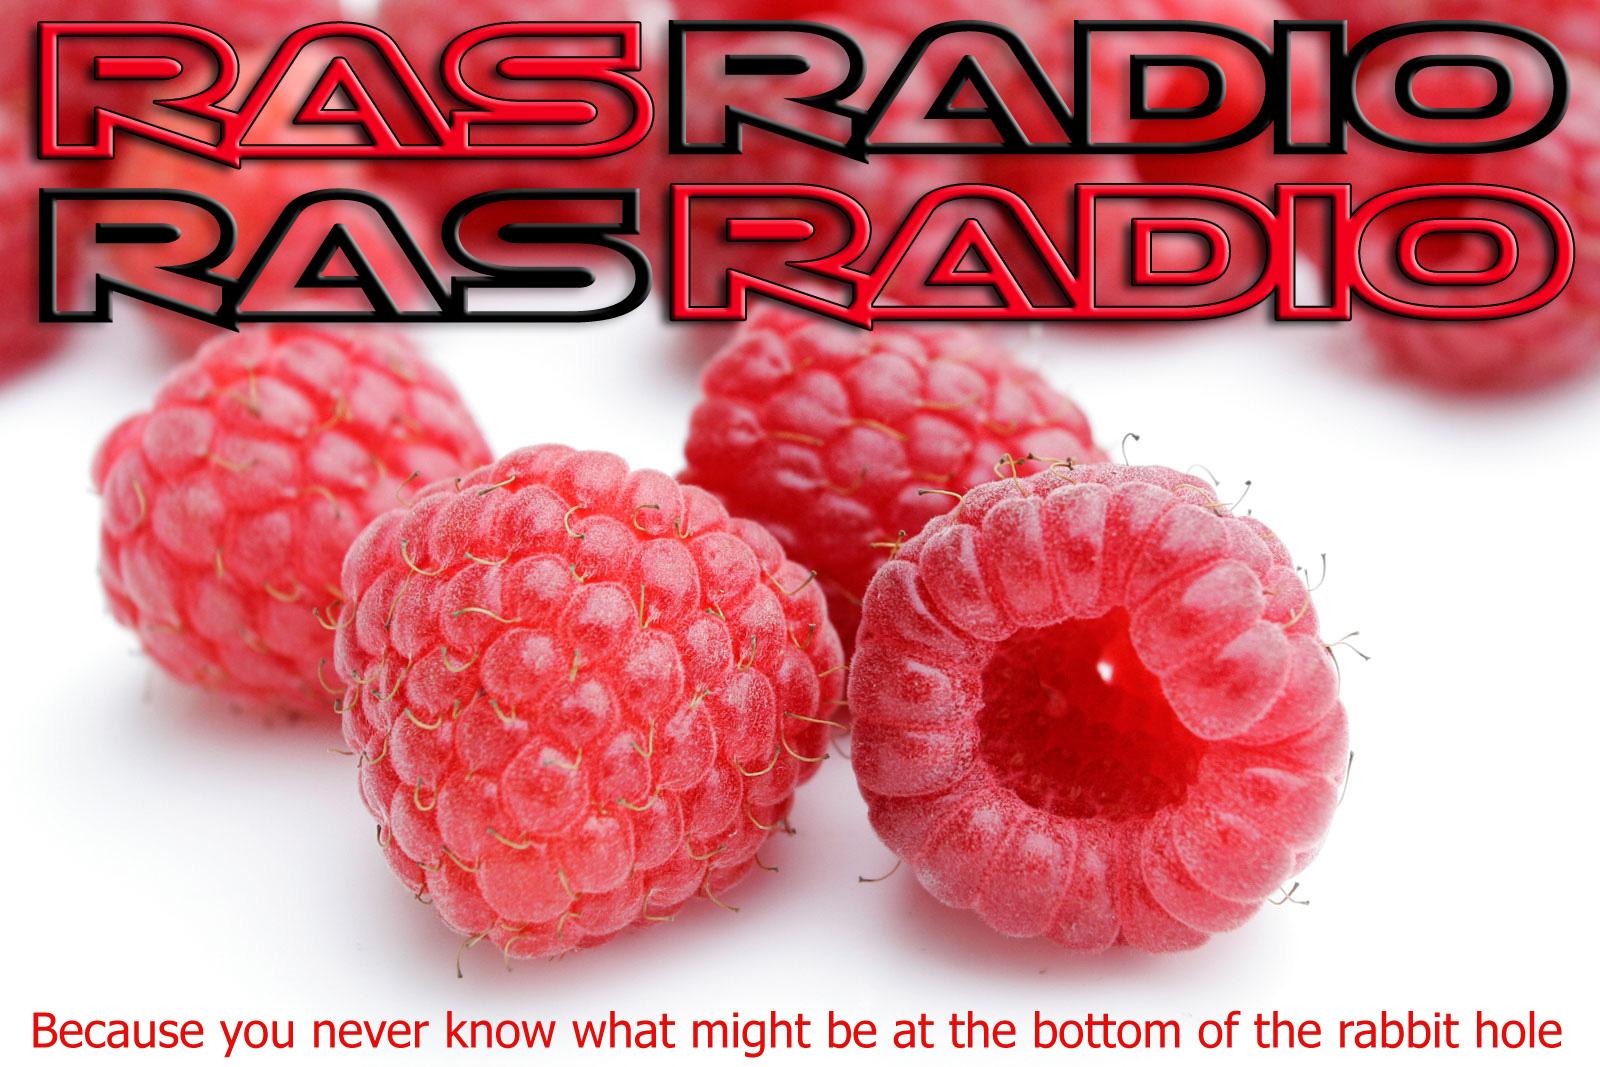 rasradio2